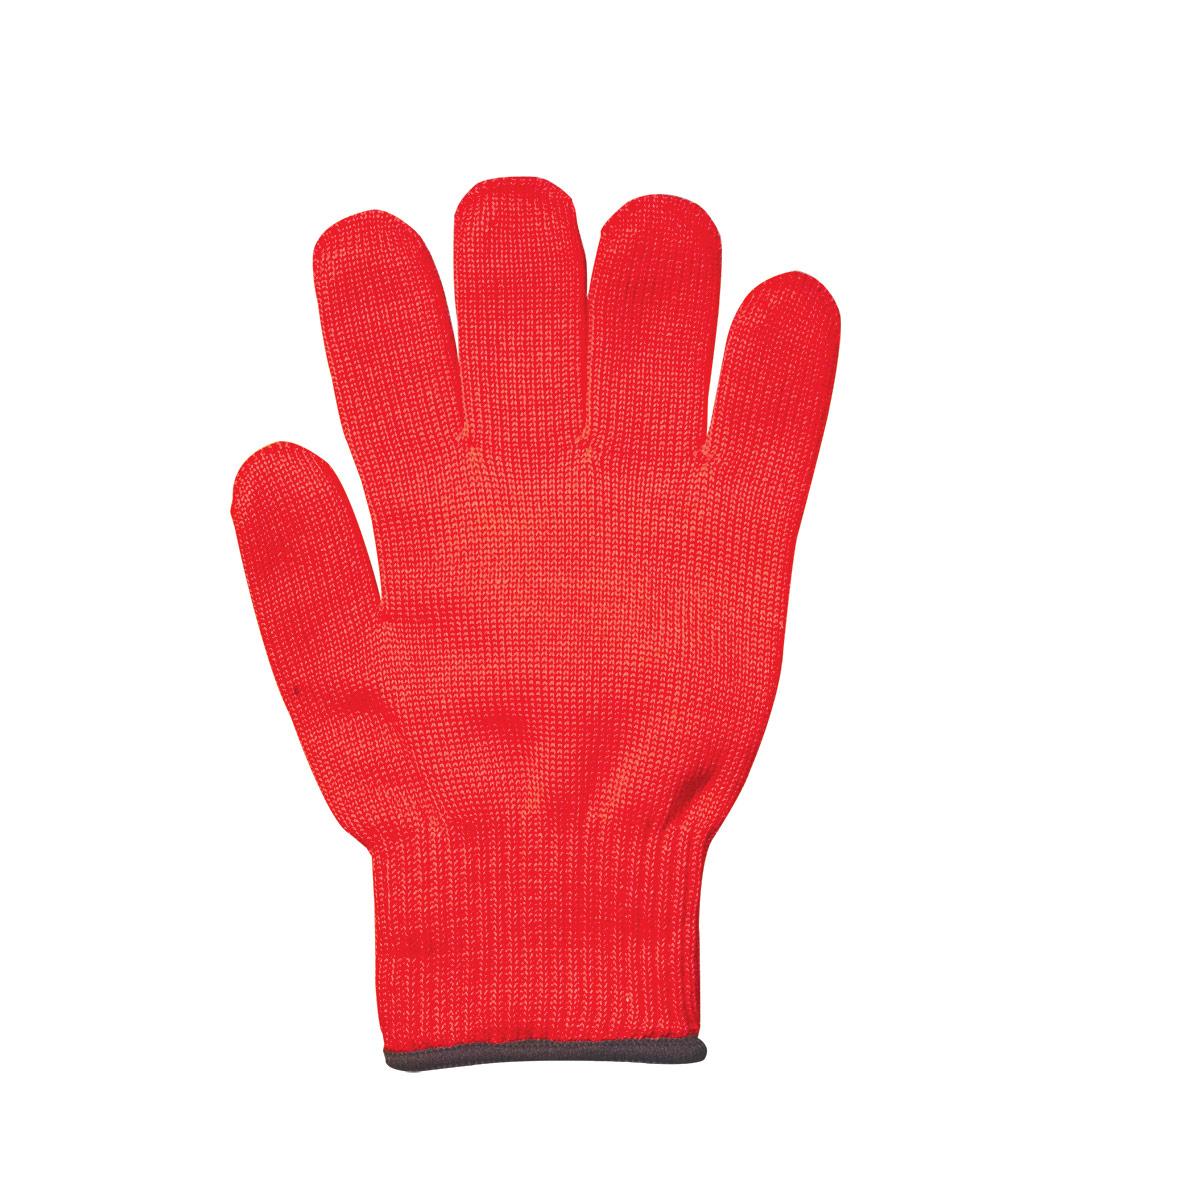 Heat Oven Glove - Red